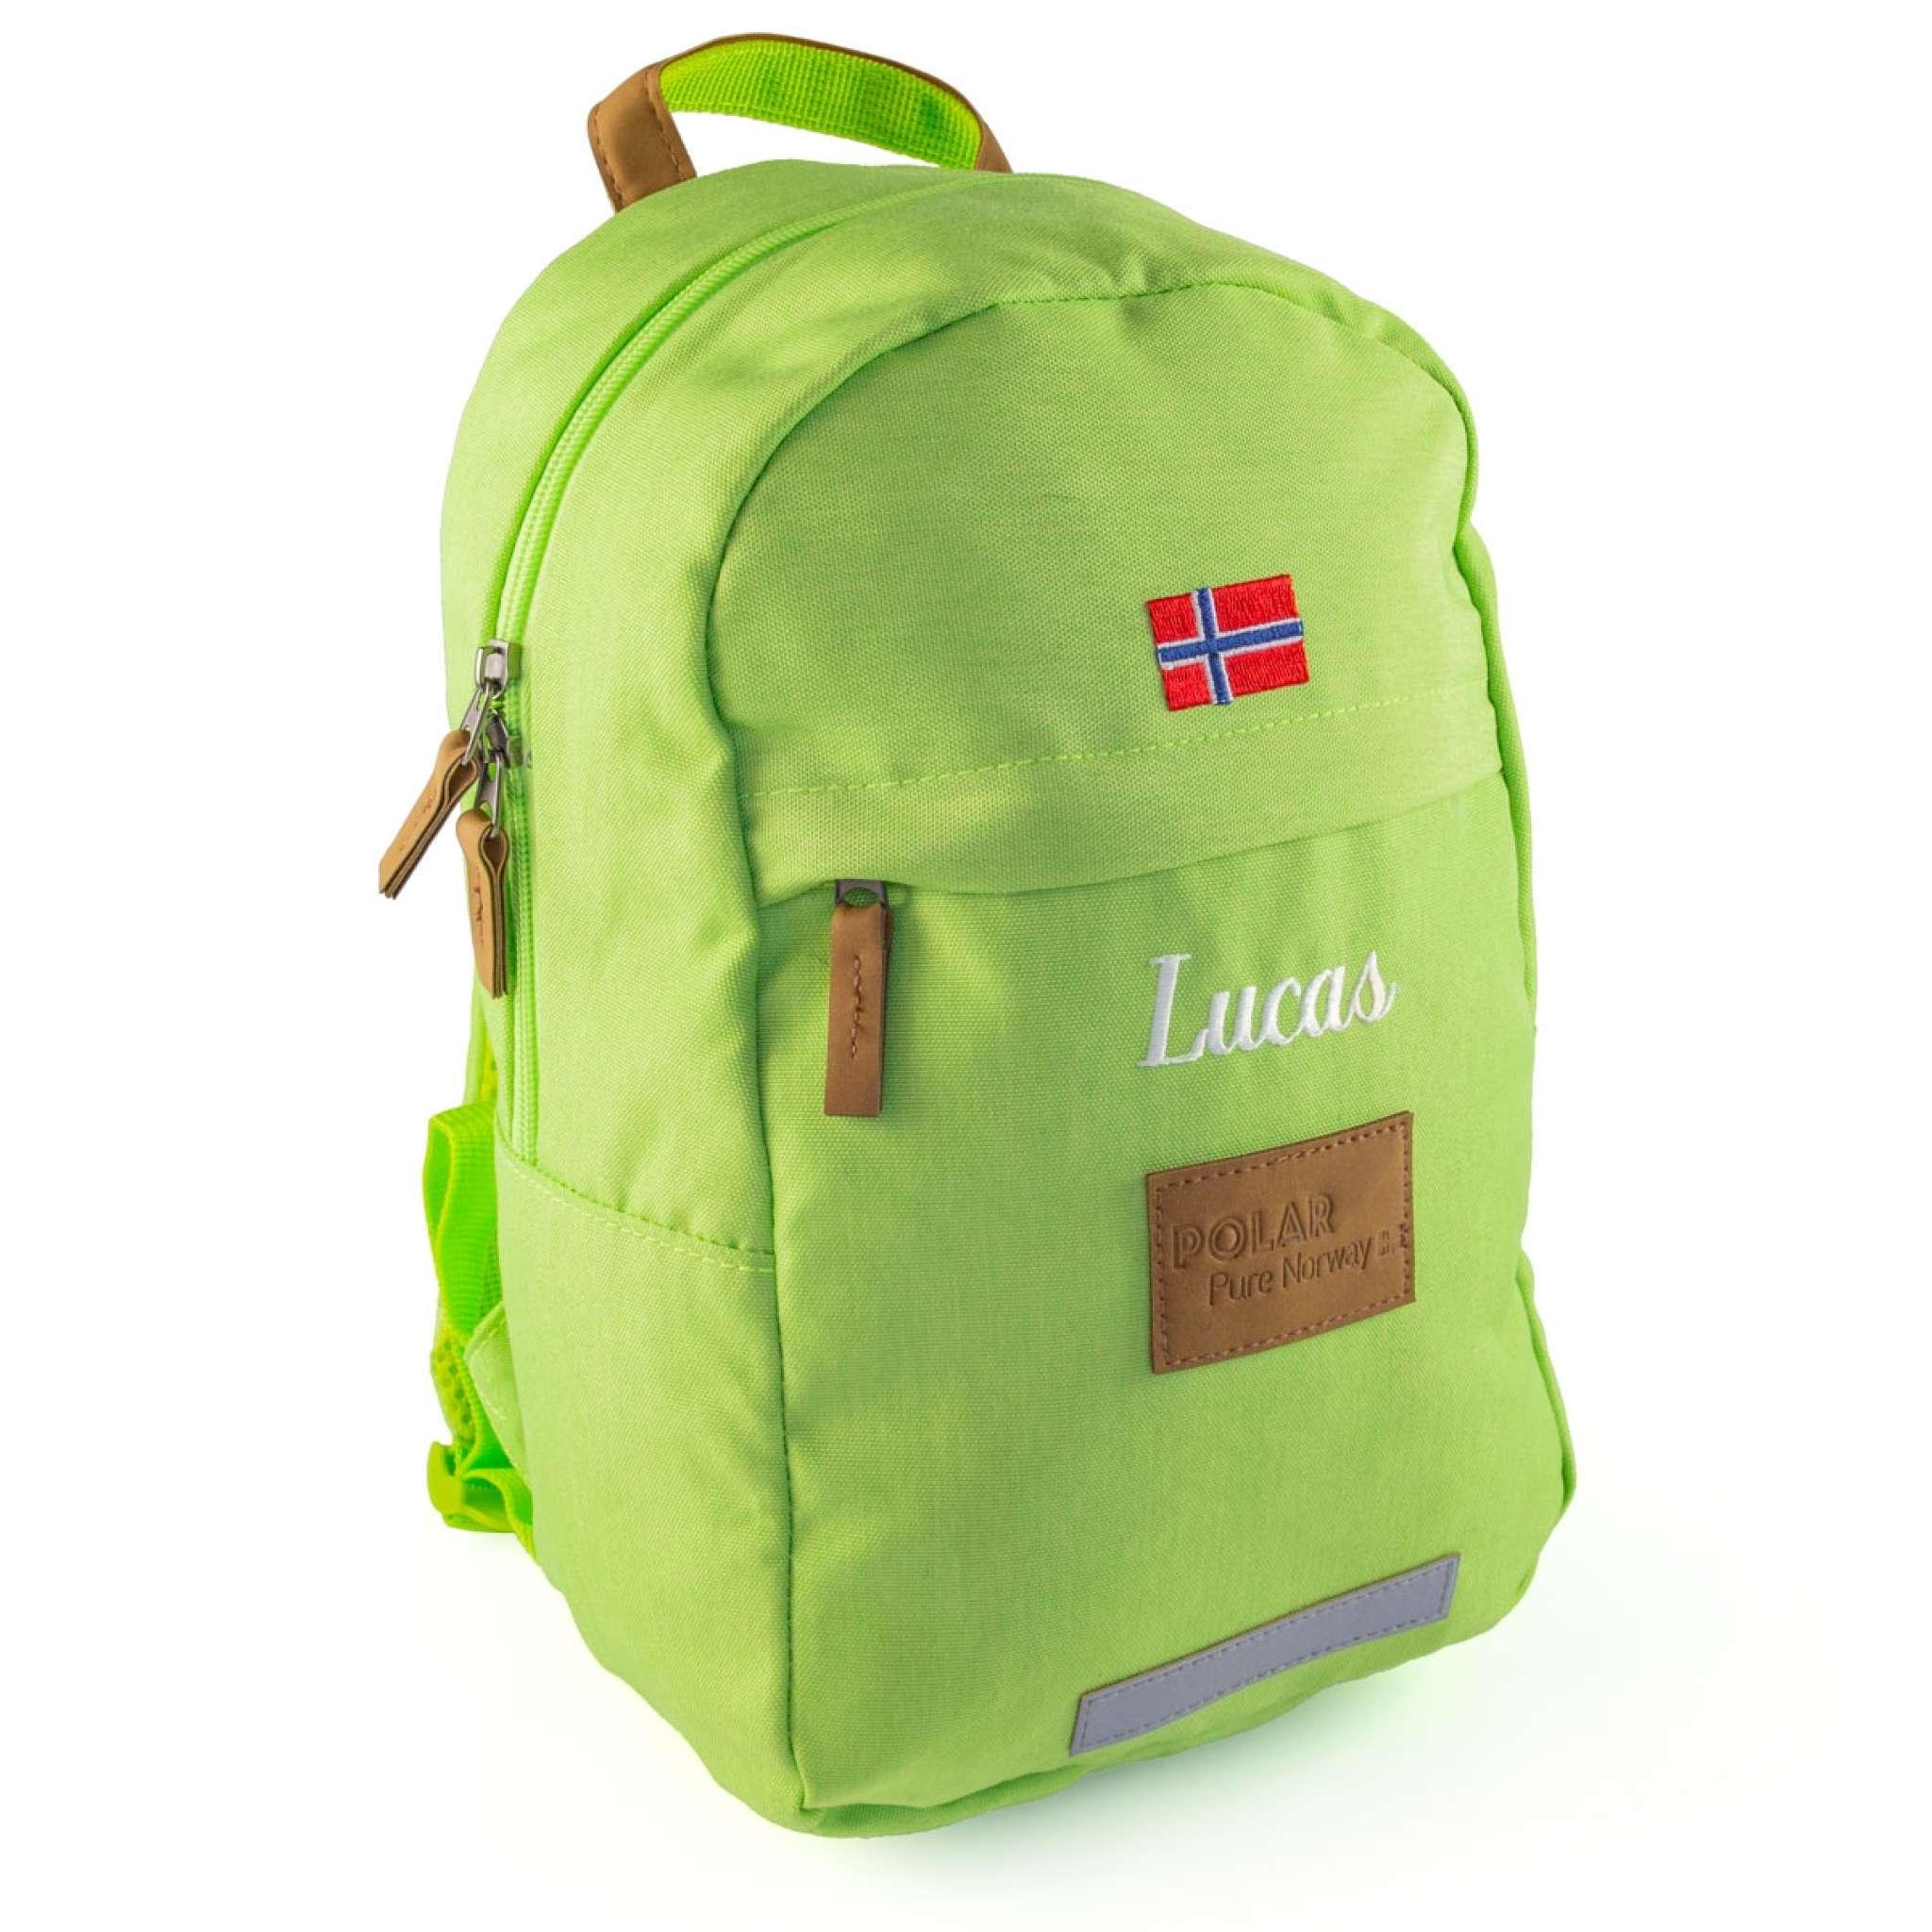 Polar Pure Norway ryggsekk 10 liter, Grønn